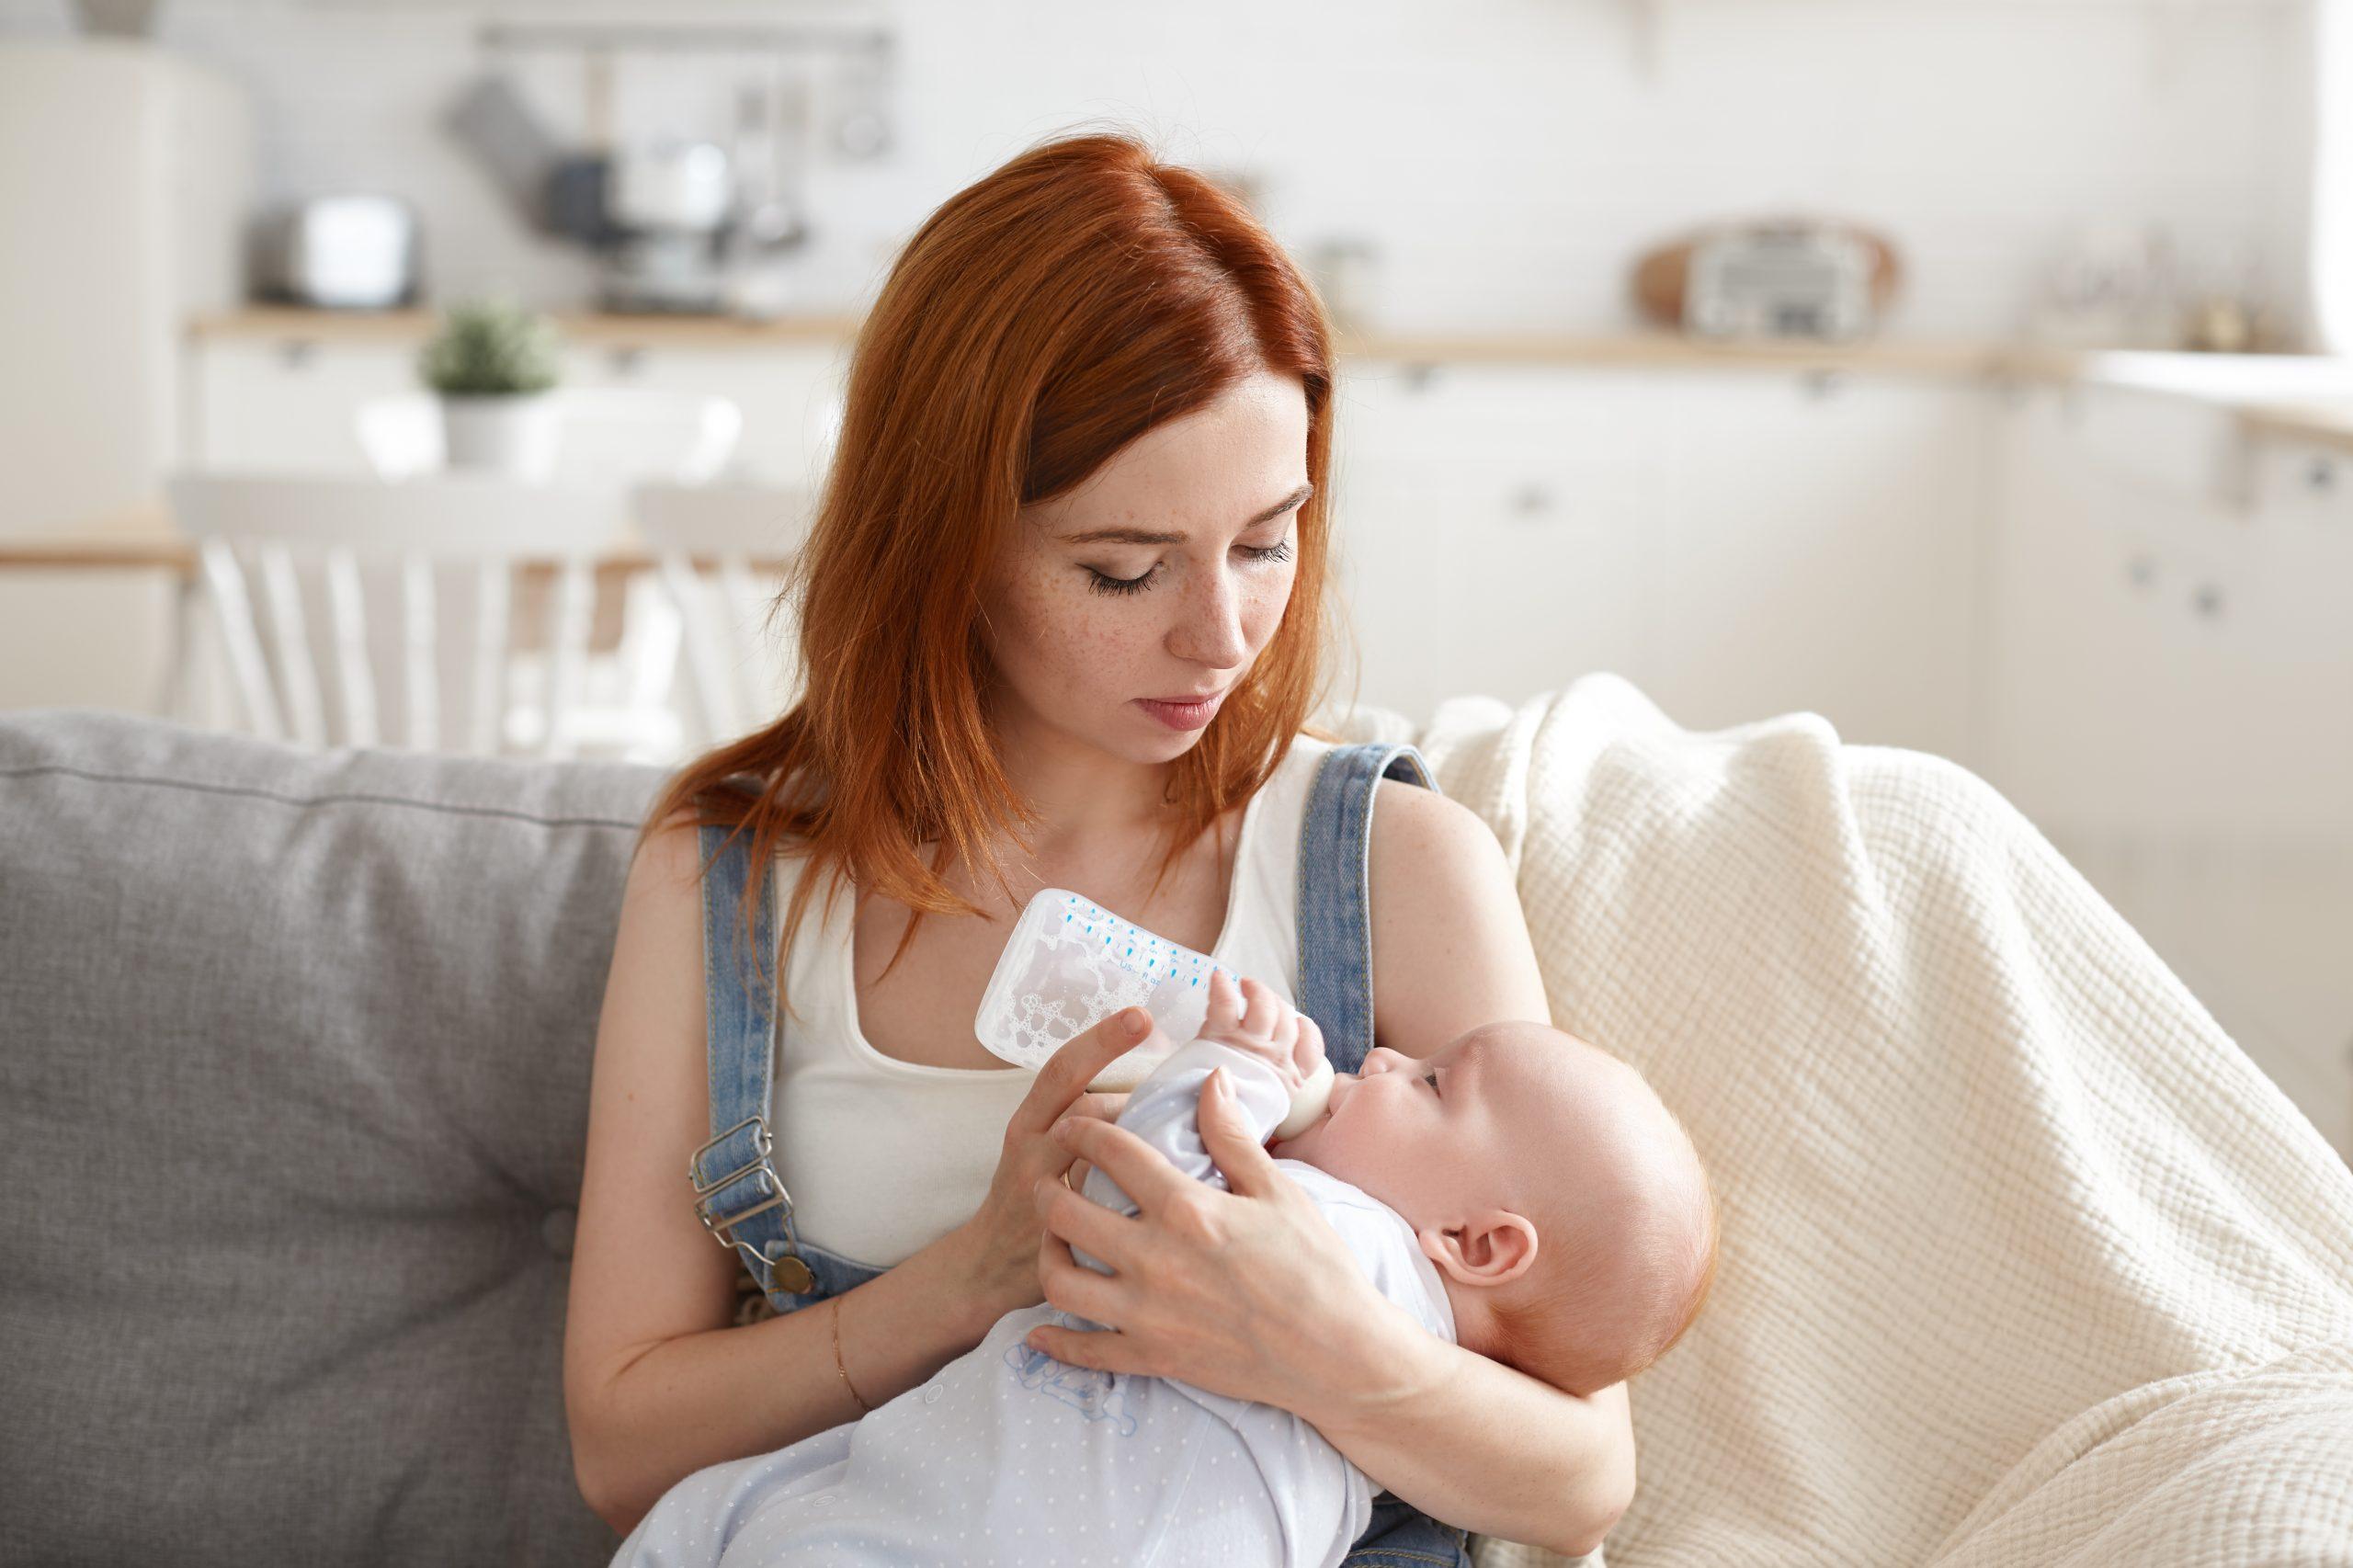 Baby photo created by shurkin_son - www.freepik.com